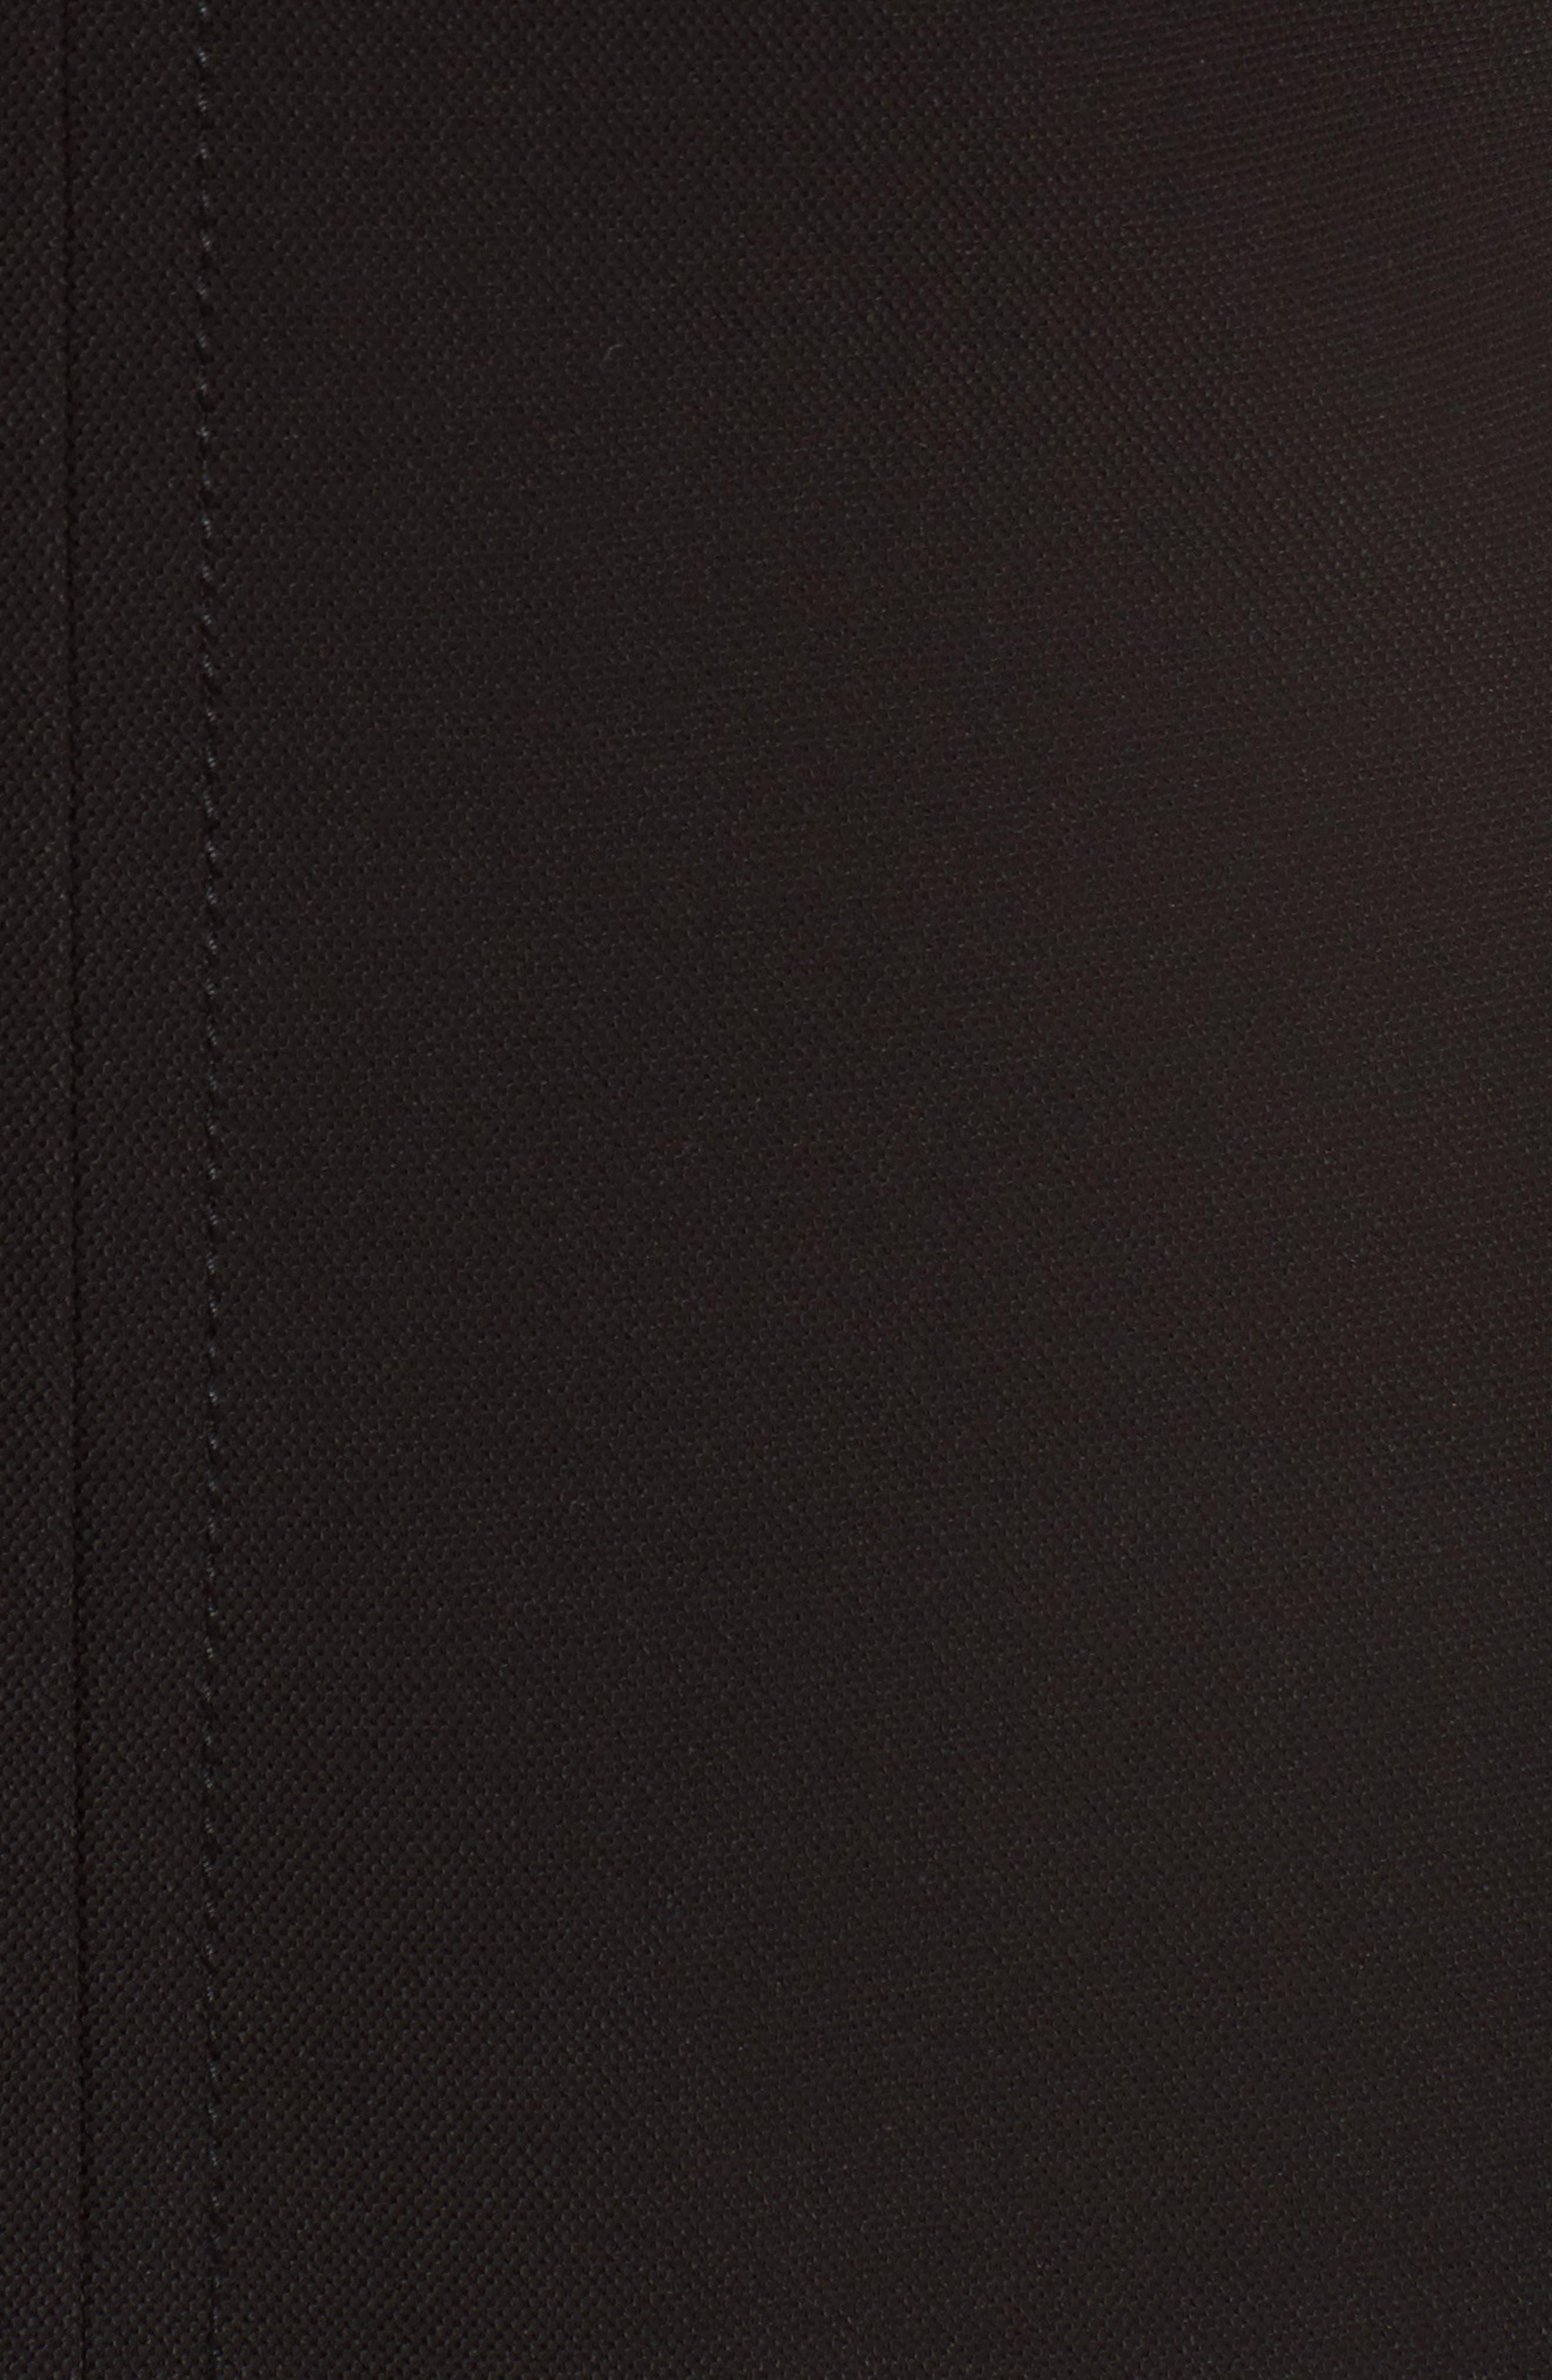 Ilamena Top,                             Alternate thumbnail 5, color,                             Black